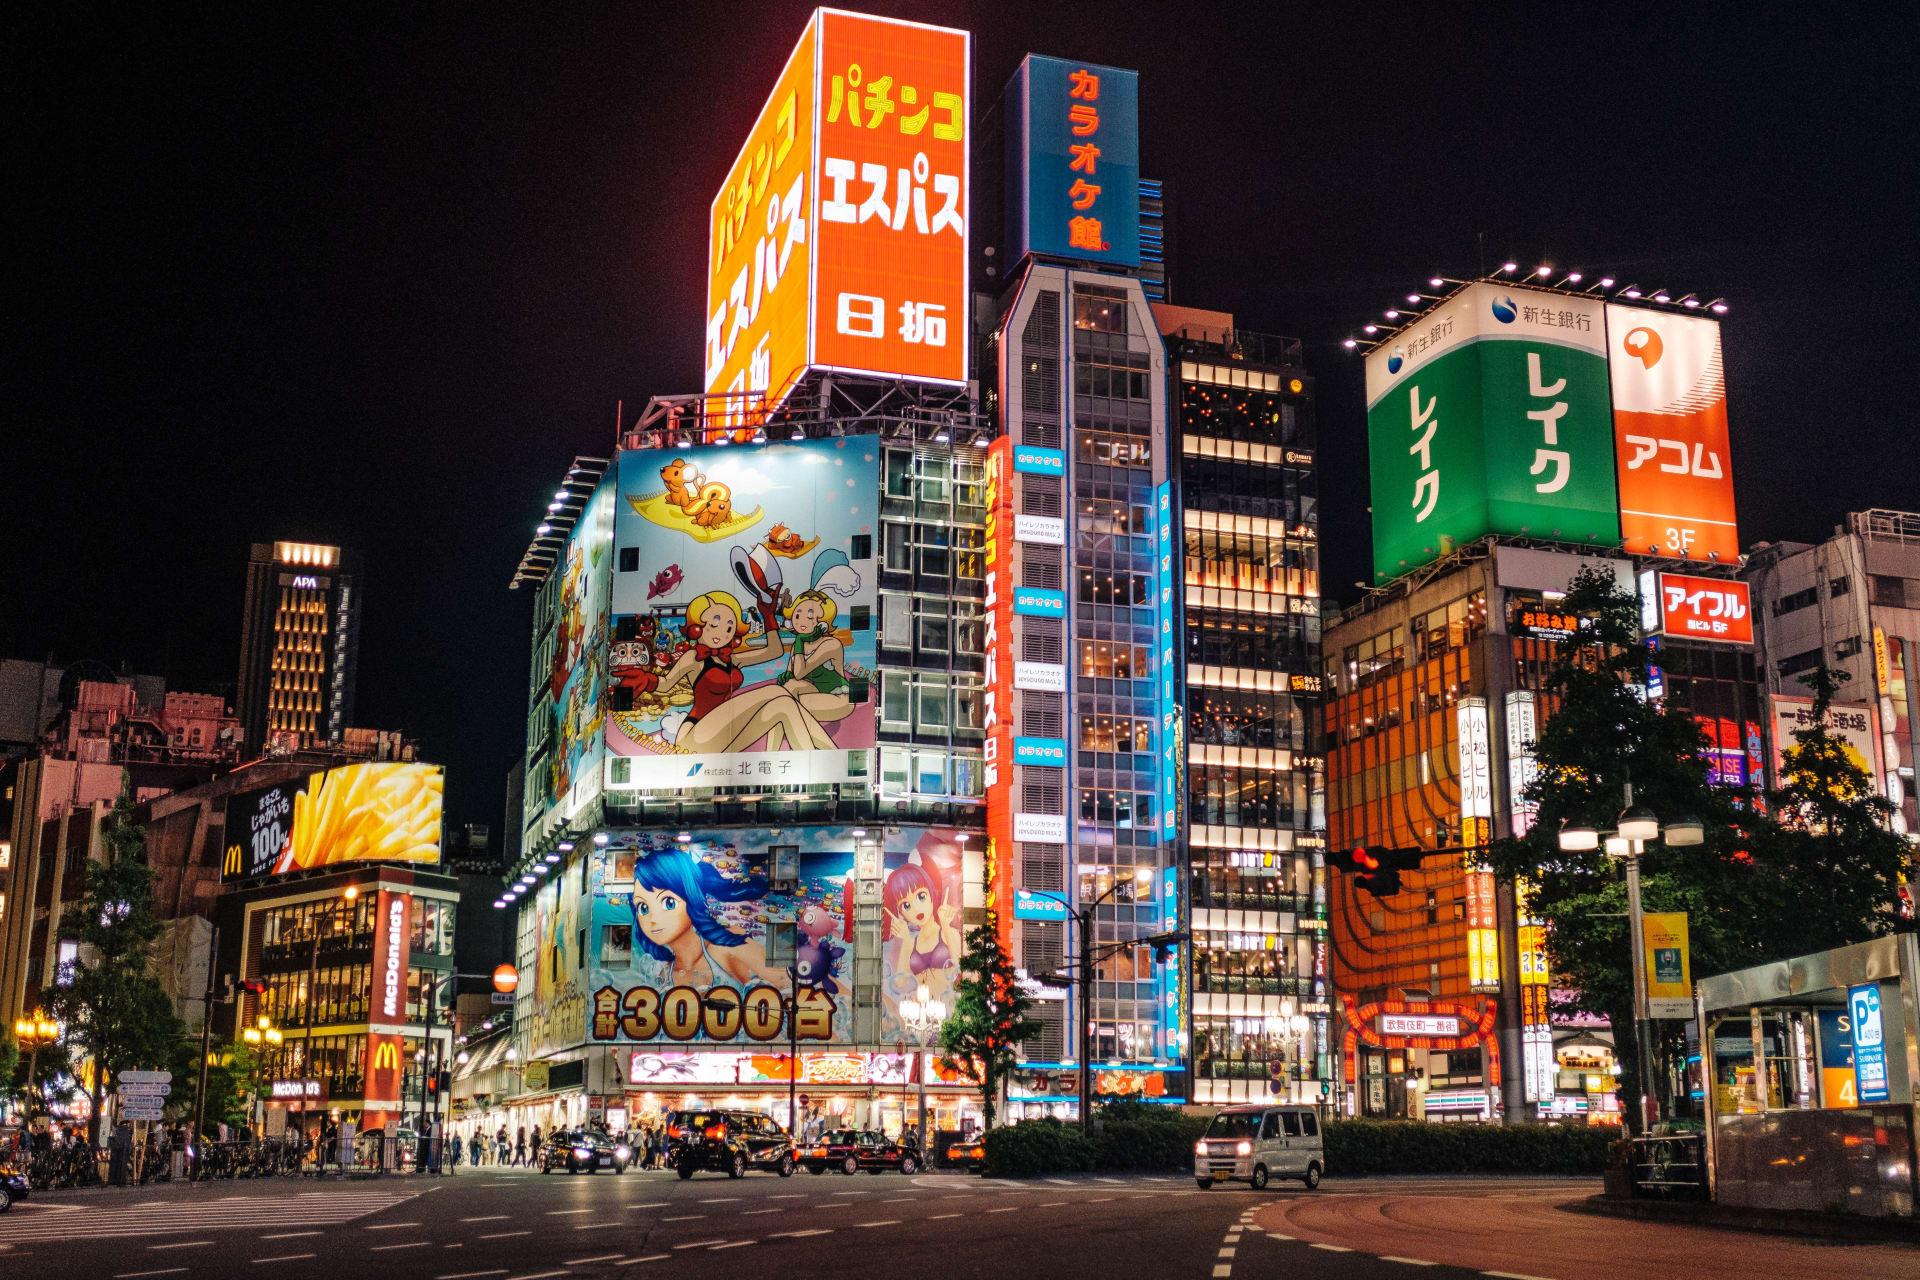 Tokyo - The Glittering Lights of Shinjuku